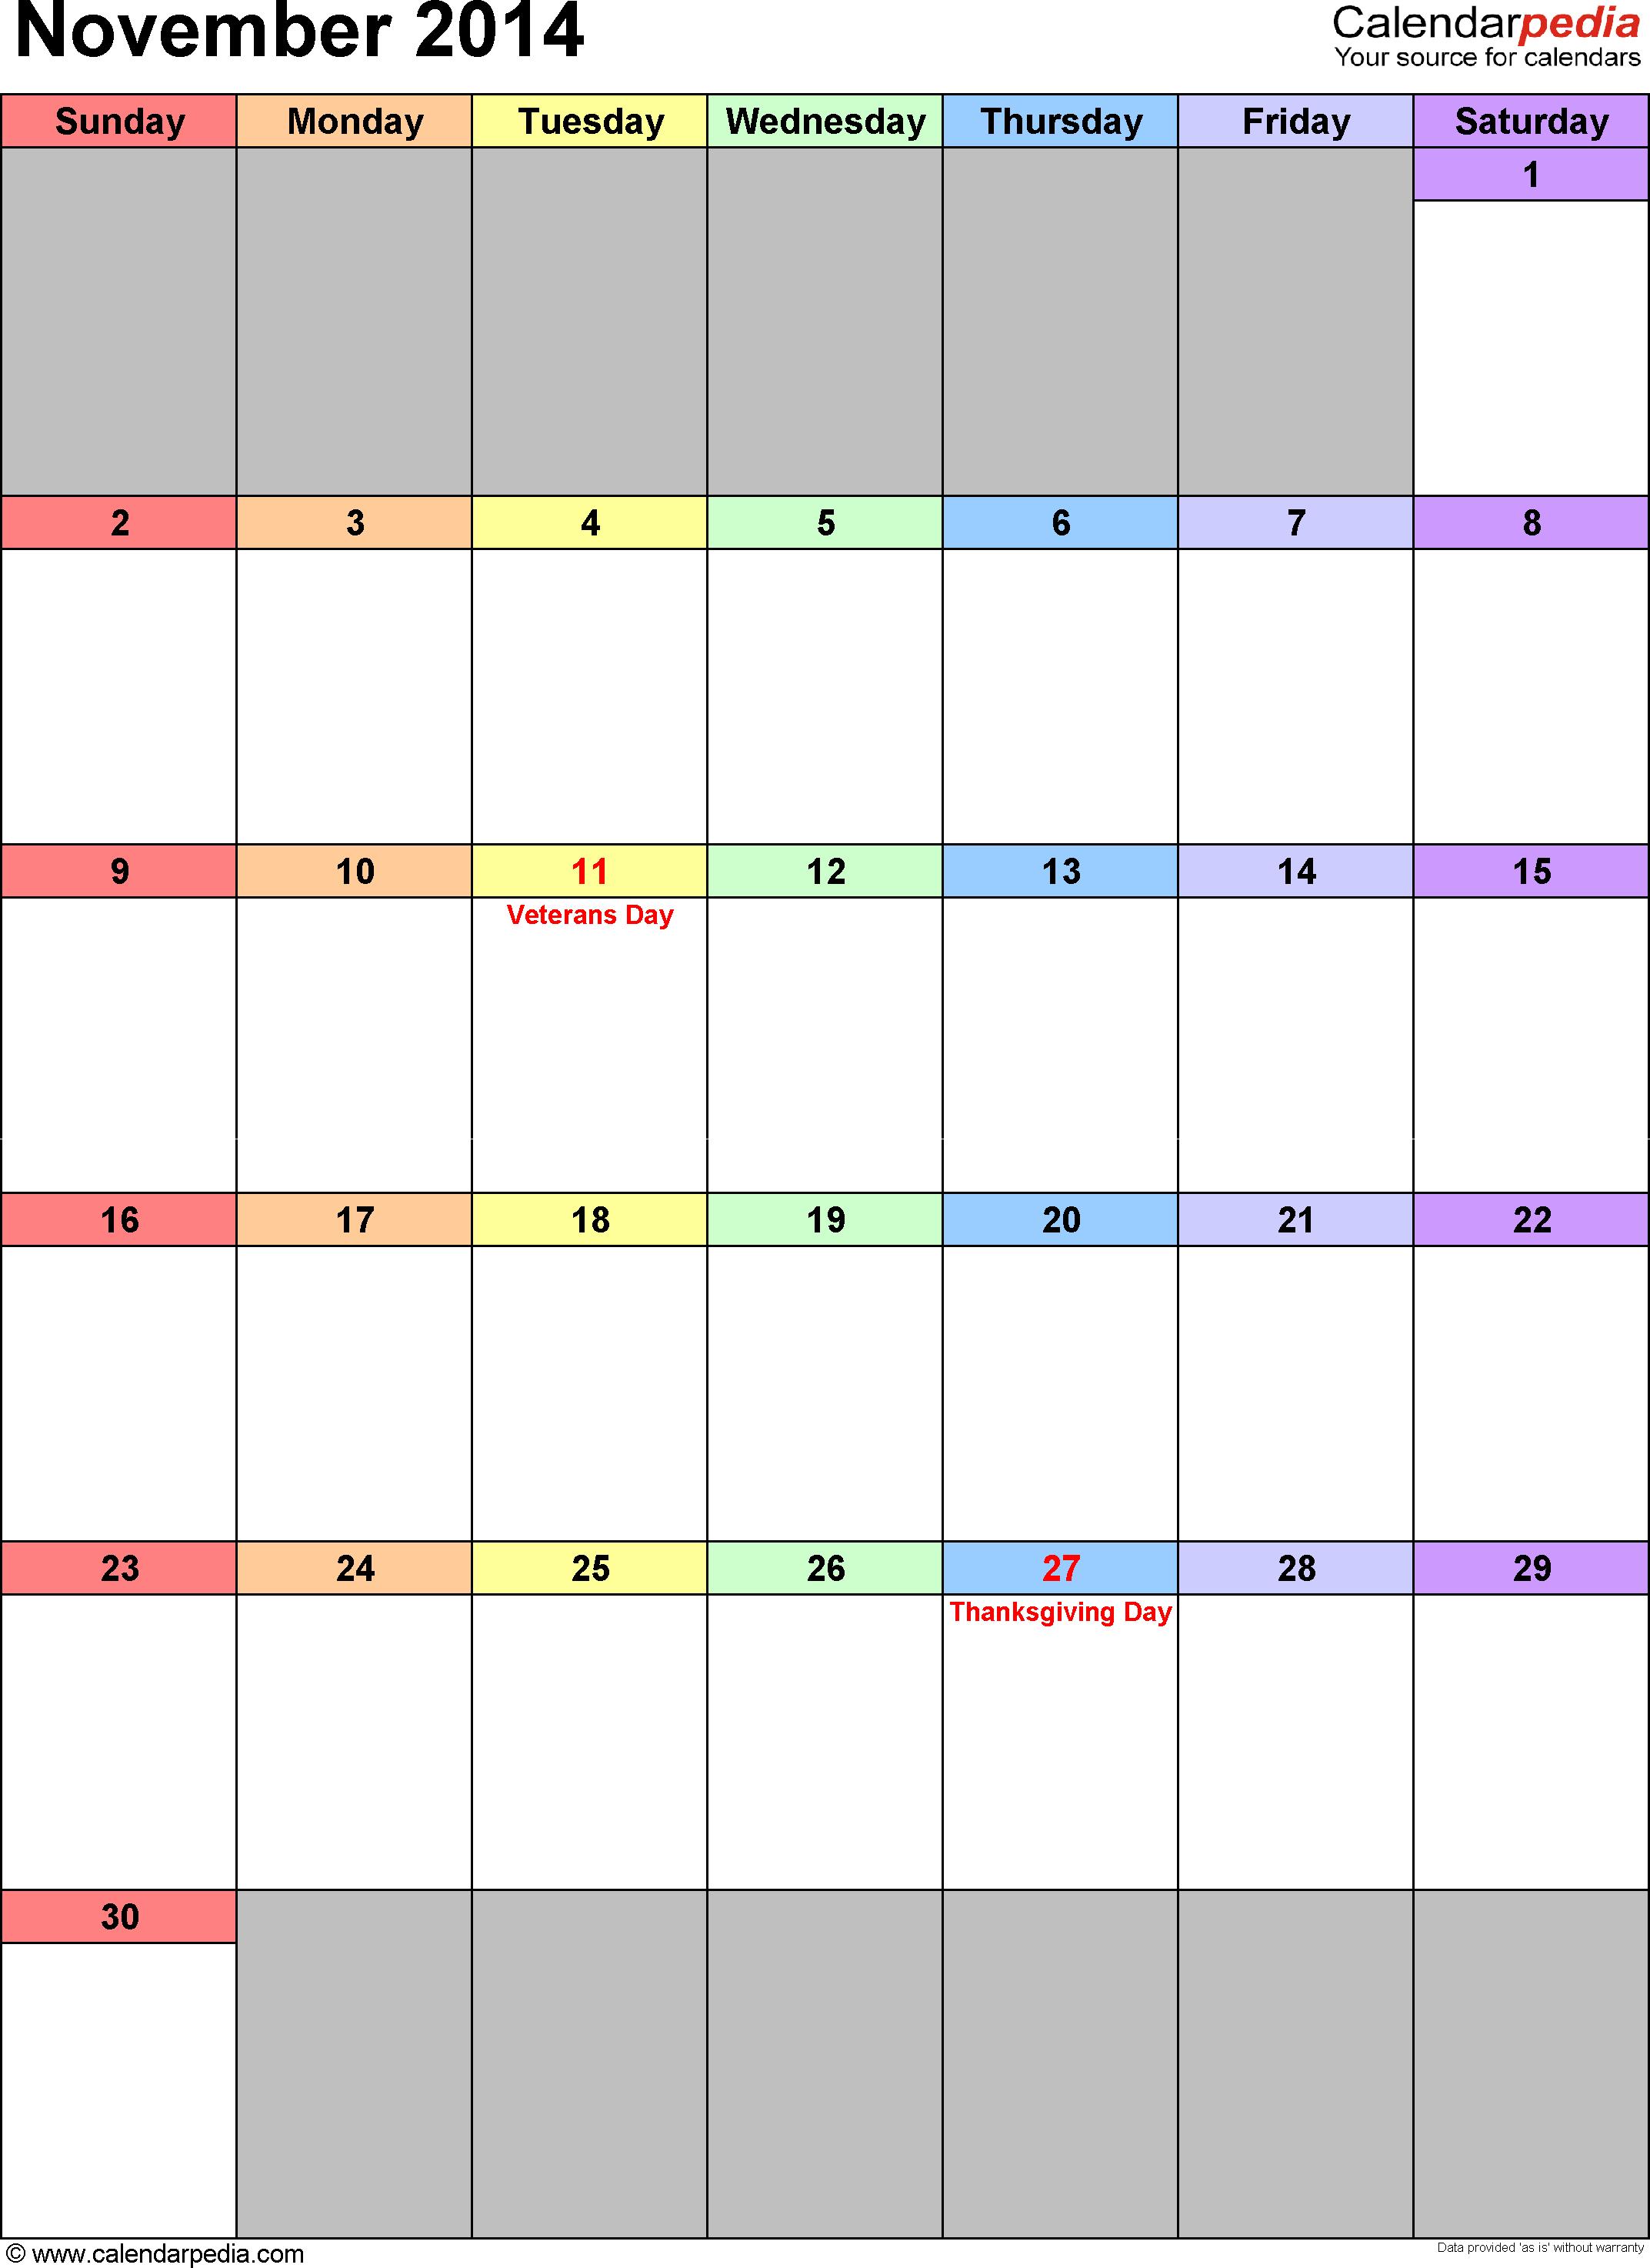 November 2014 calendar as printable Word, Excel & PDF templates